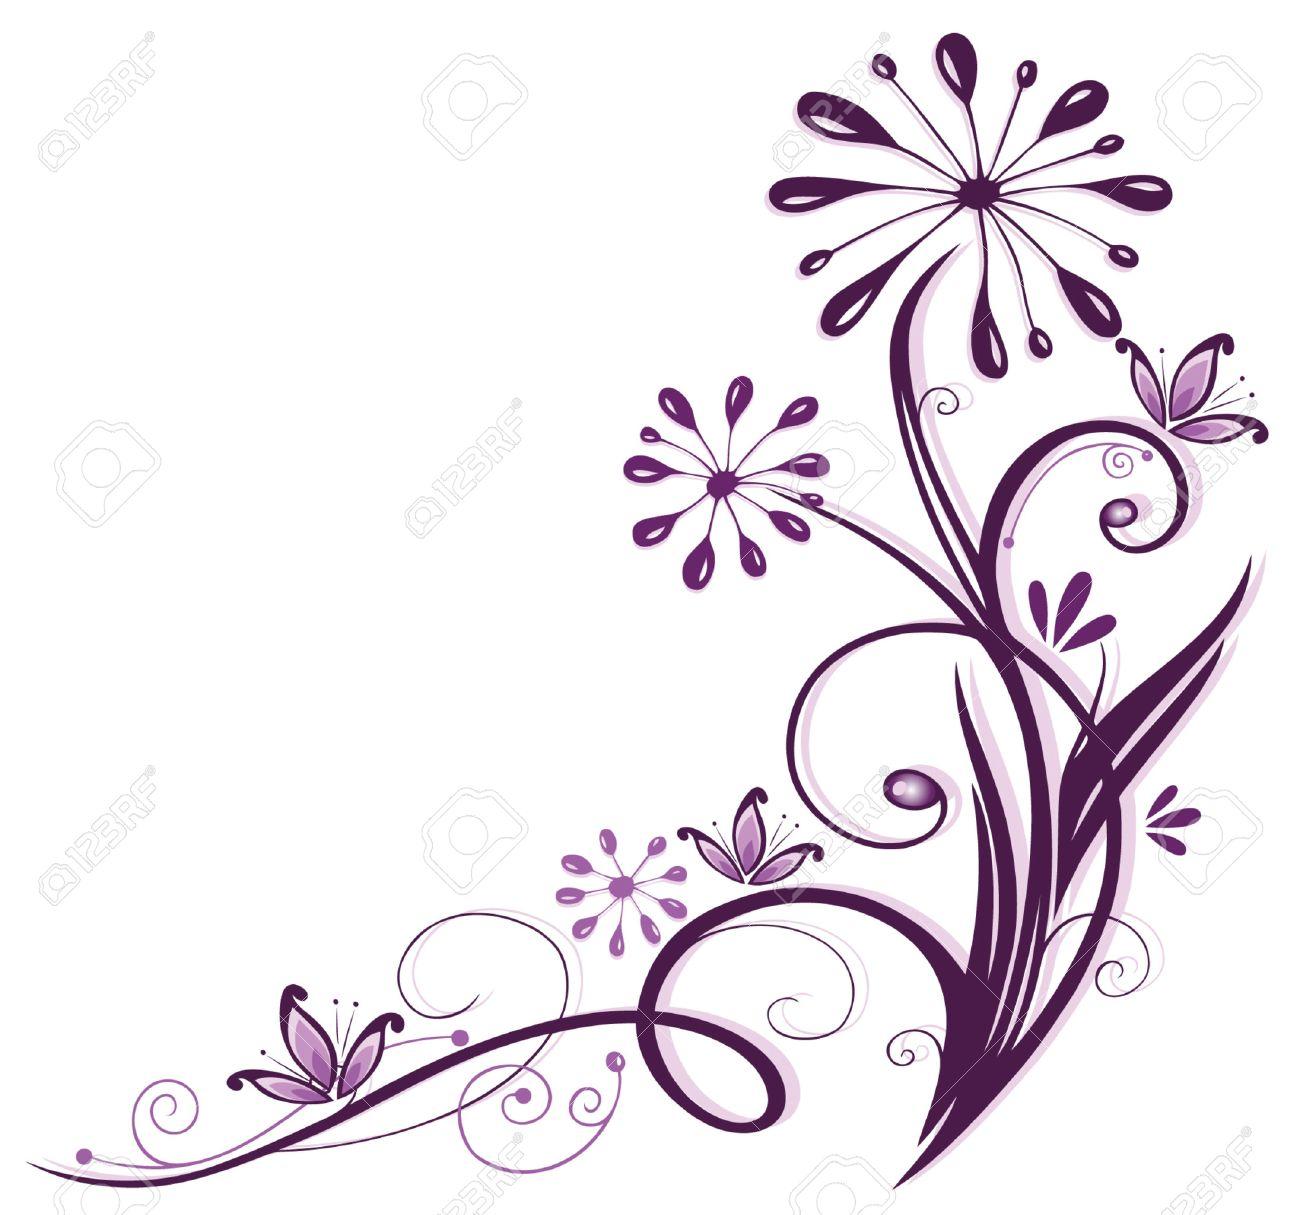 Purple and filigree flowers, floral element Standard-Bild - 23246964